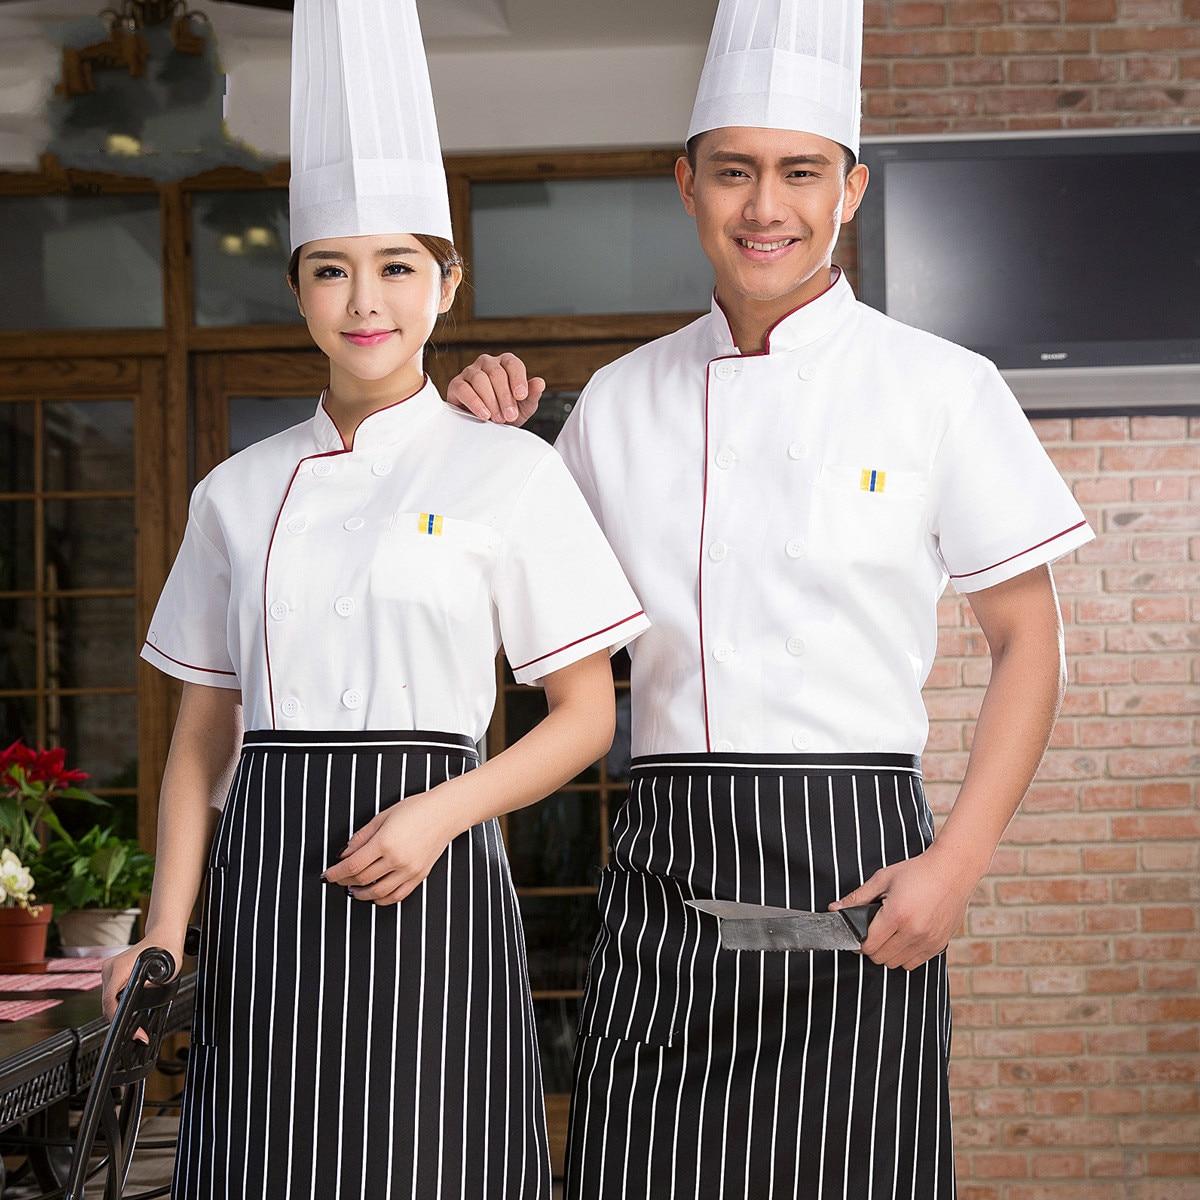 men chefs uniforms short sleeve restaurant chef clothing